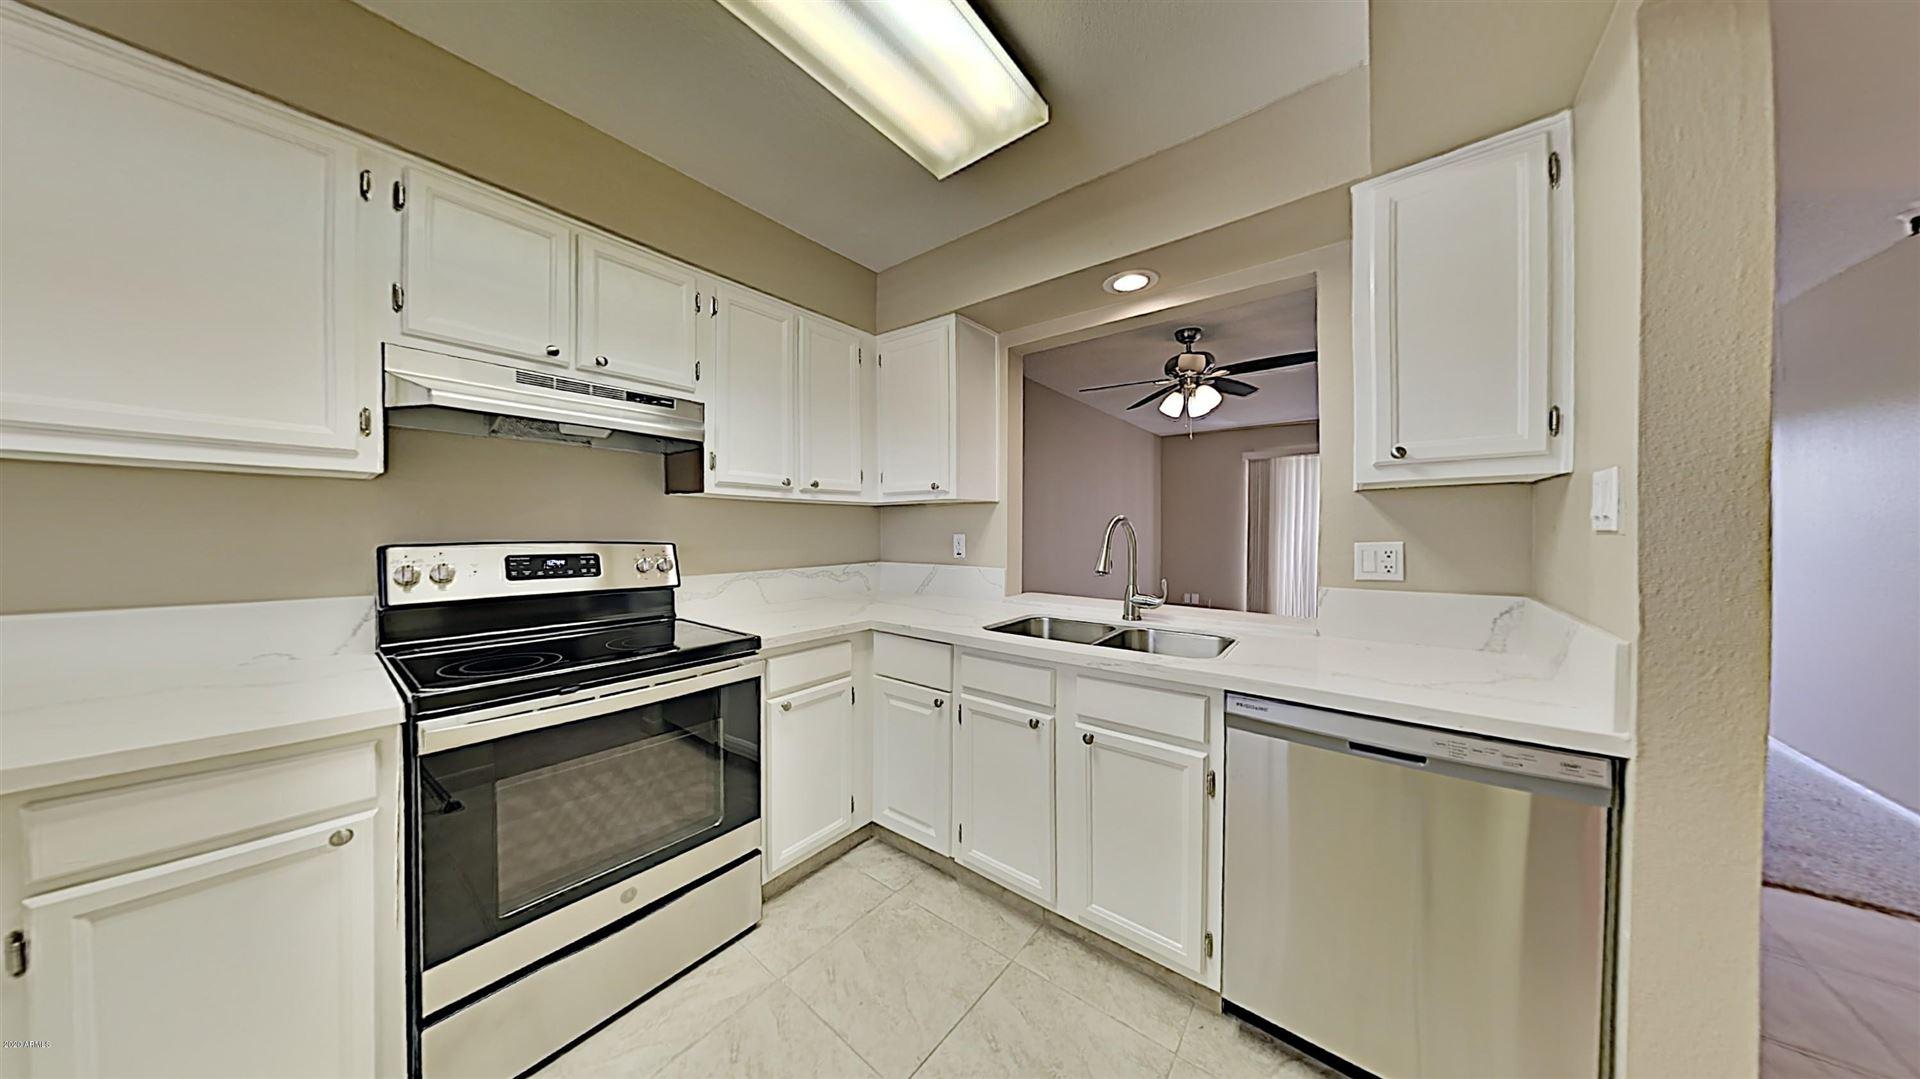 7474 E EARLL Drive #314, Scottsdale, AZ 85251 - MLS#: 6133088